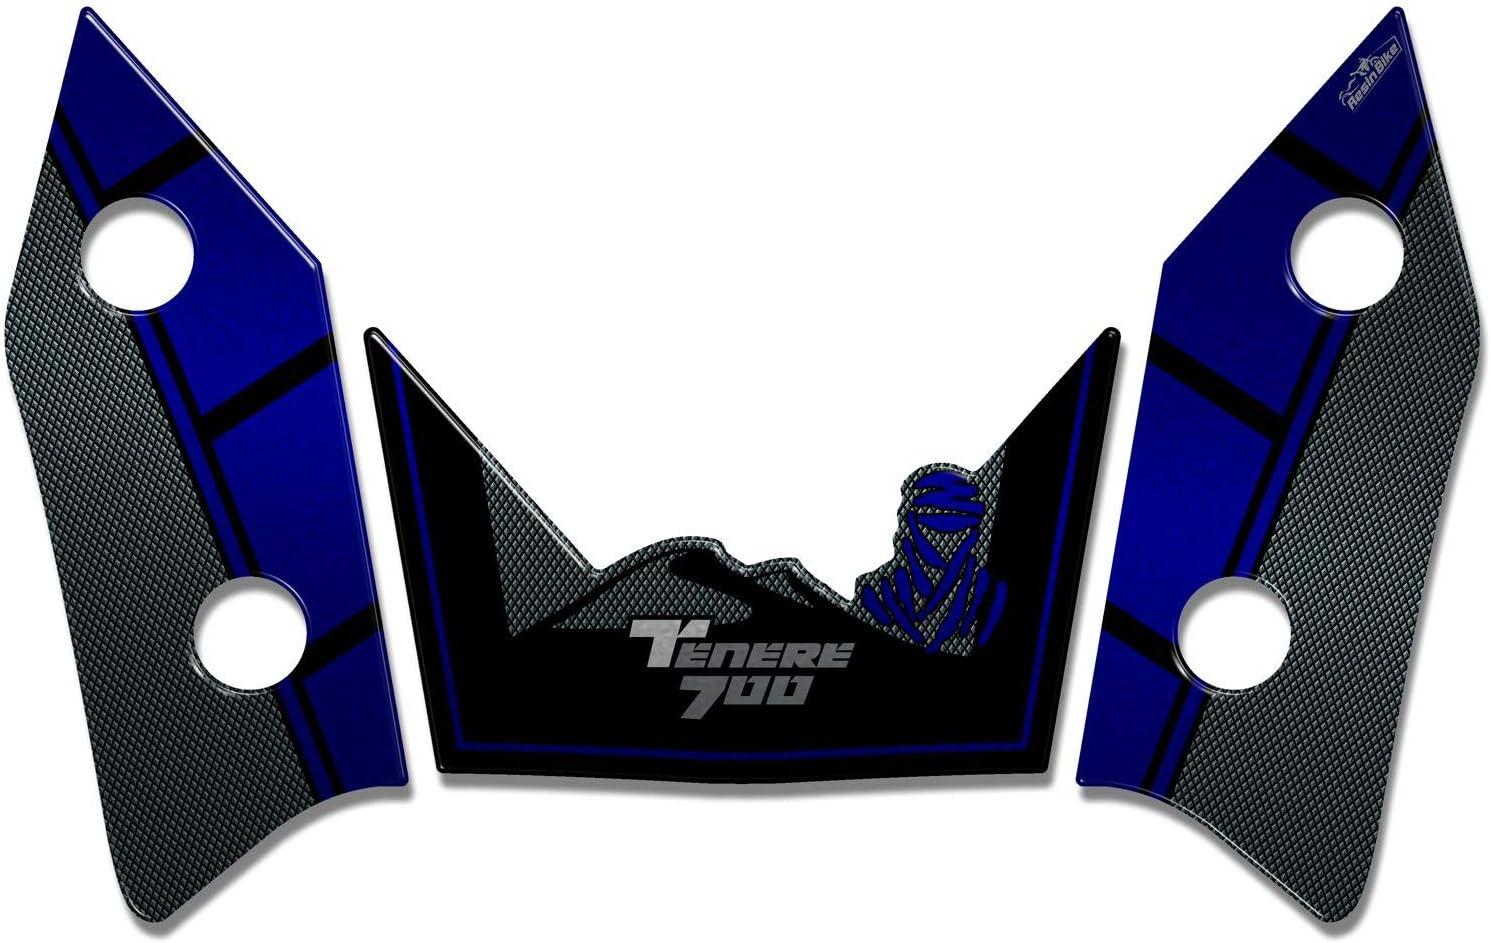 Adh/ésifs 3D Protections Lat/éral 05 Compatible avec Yamaha Tenere 700 2019 Jaune